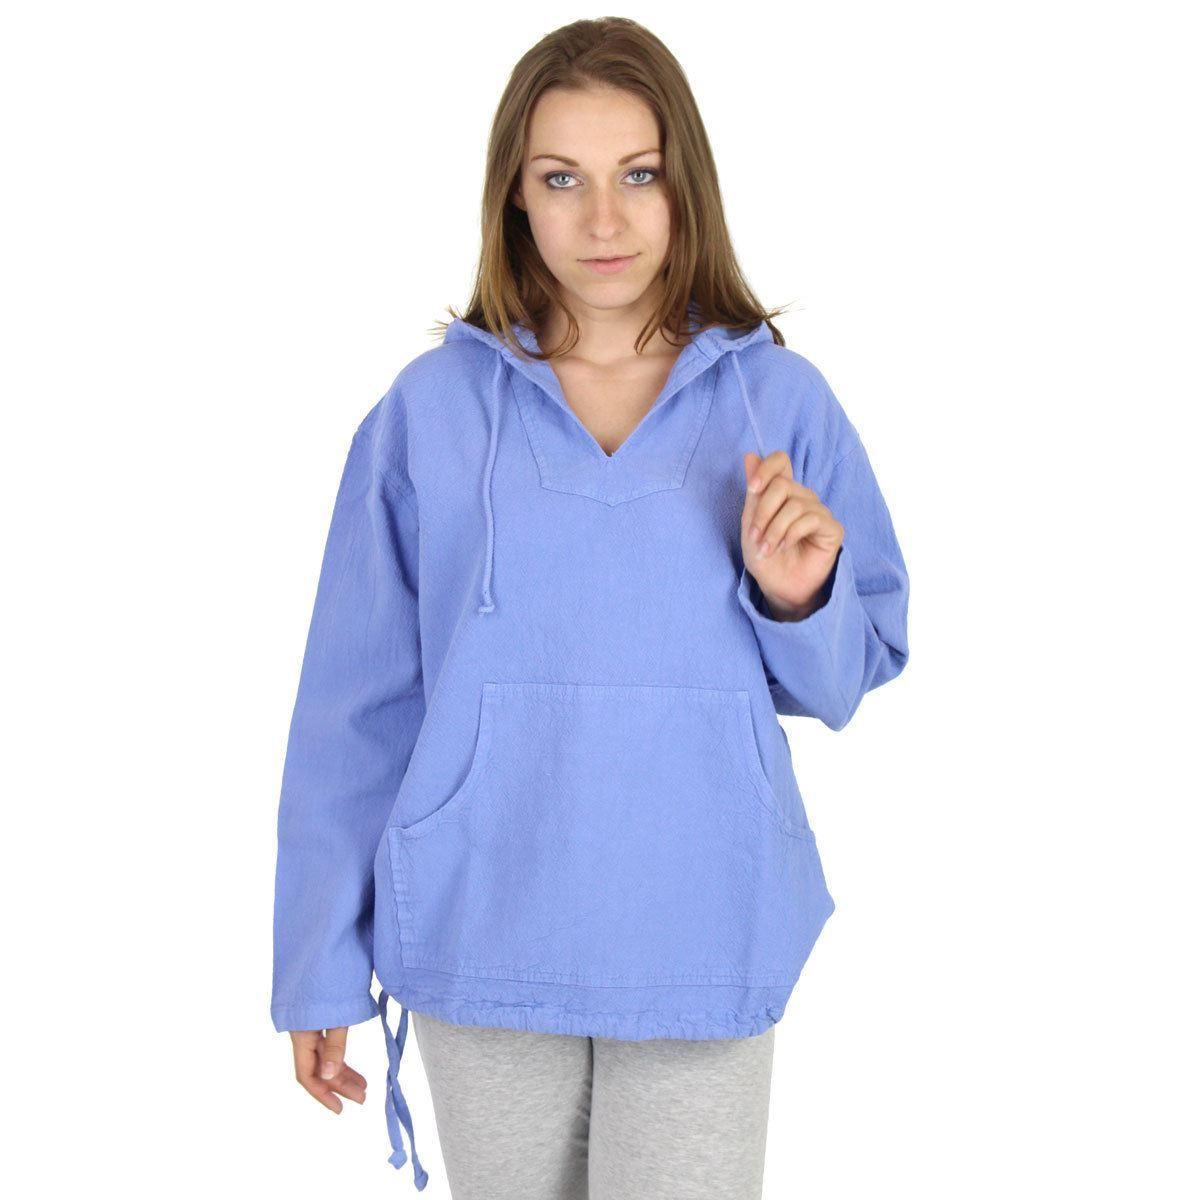 Womens Crinkle Cotton Kangaroo Hoodie - 100% Cotton - Made in USA